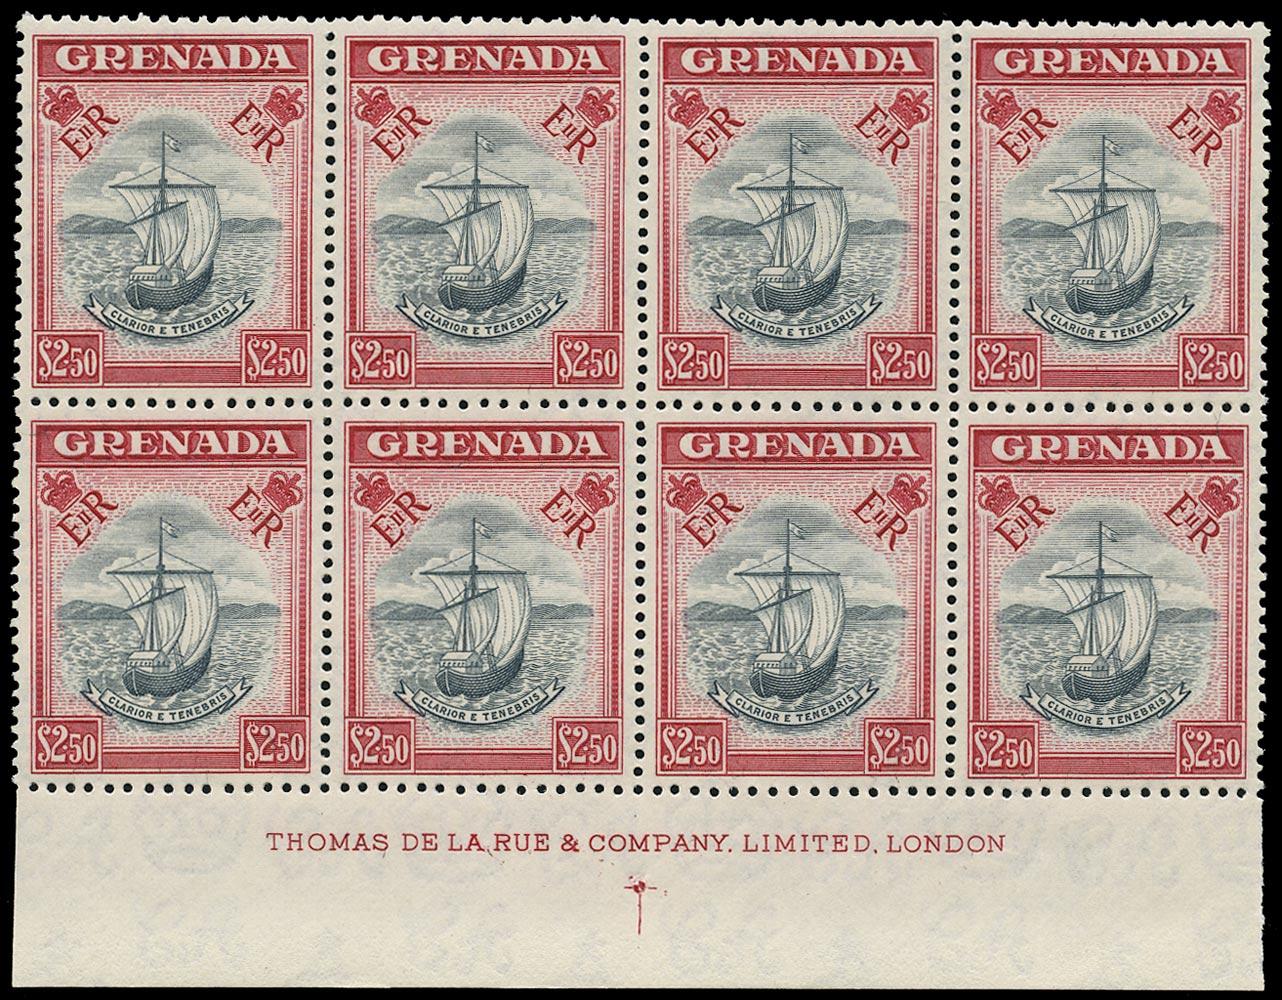 GRENADA 1953  SG204 Mint unmounted QEII $2.50 slate-blue and carmine imprint block of 8